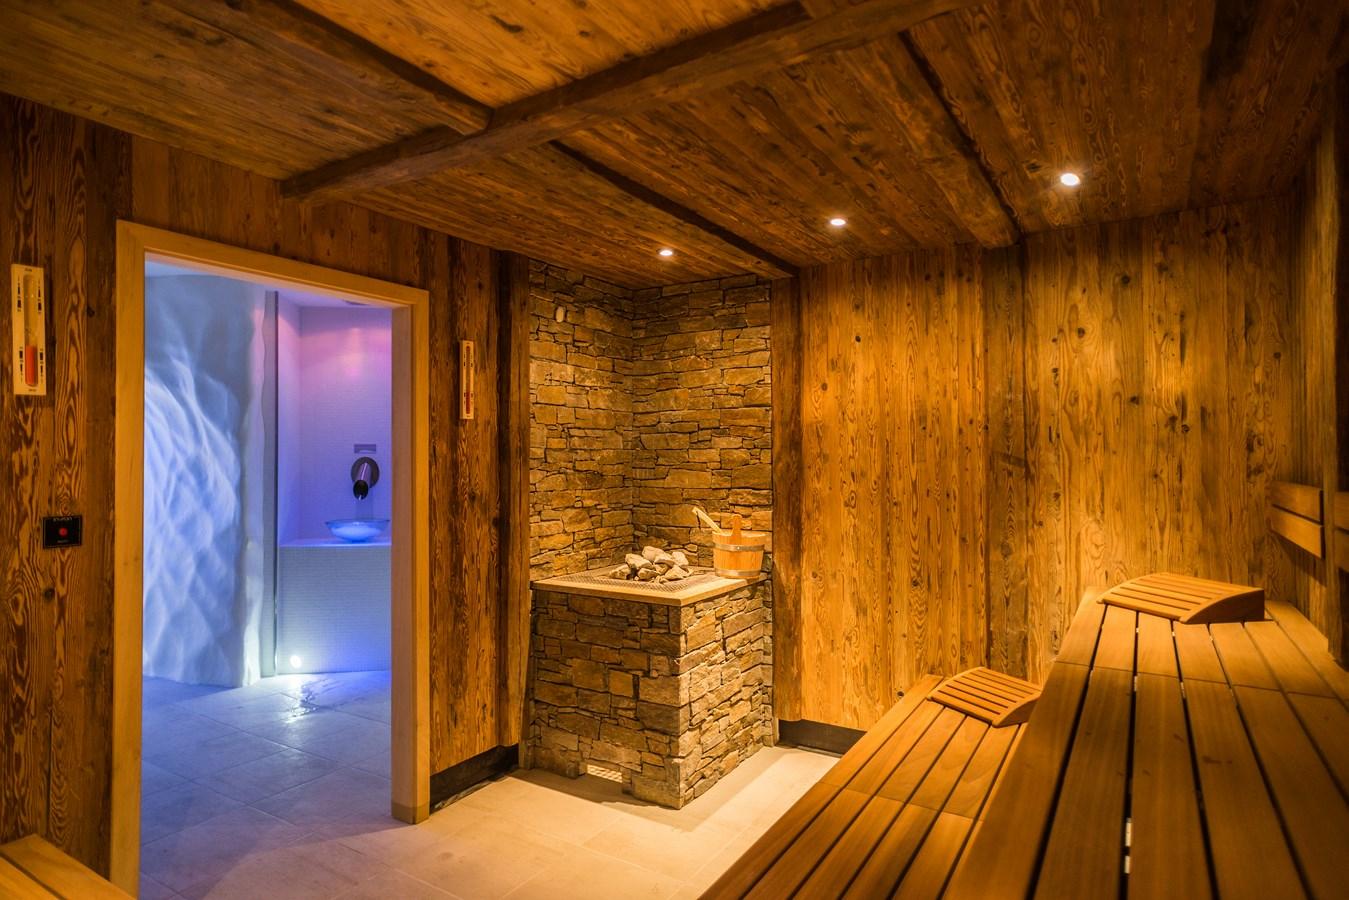 l 39 actu spa bien etre blog archive aplus tourisme spa inaugure vitalspa. Black Bedroom Furniture Sets. Home Design Ideas